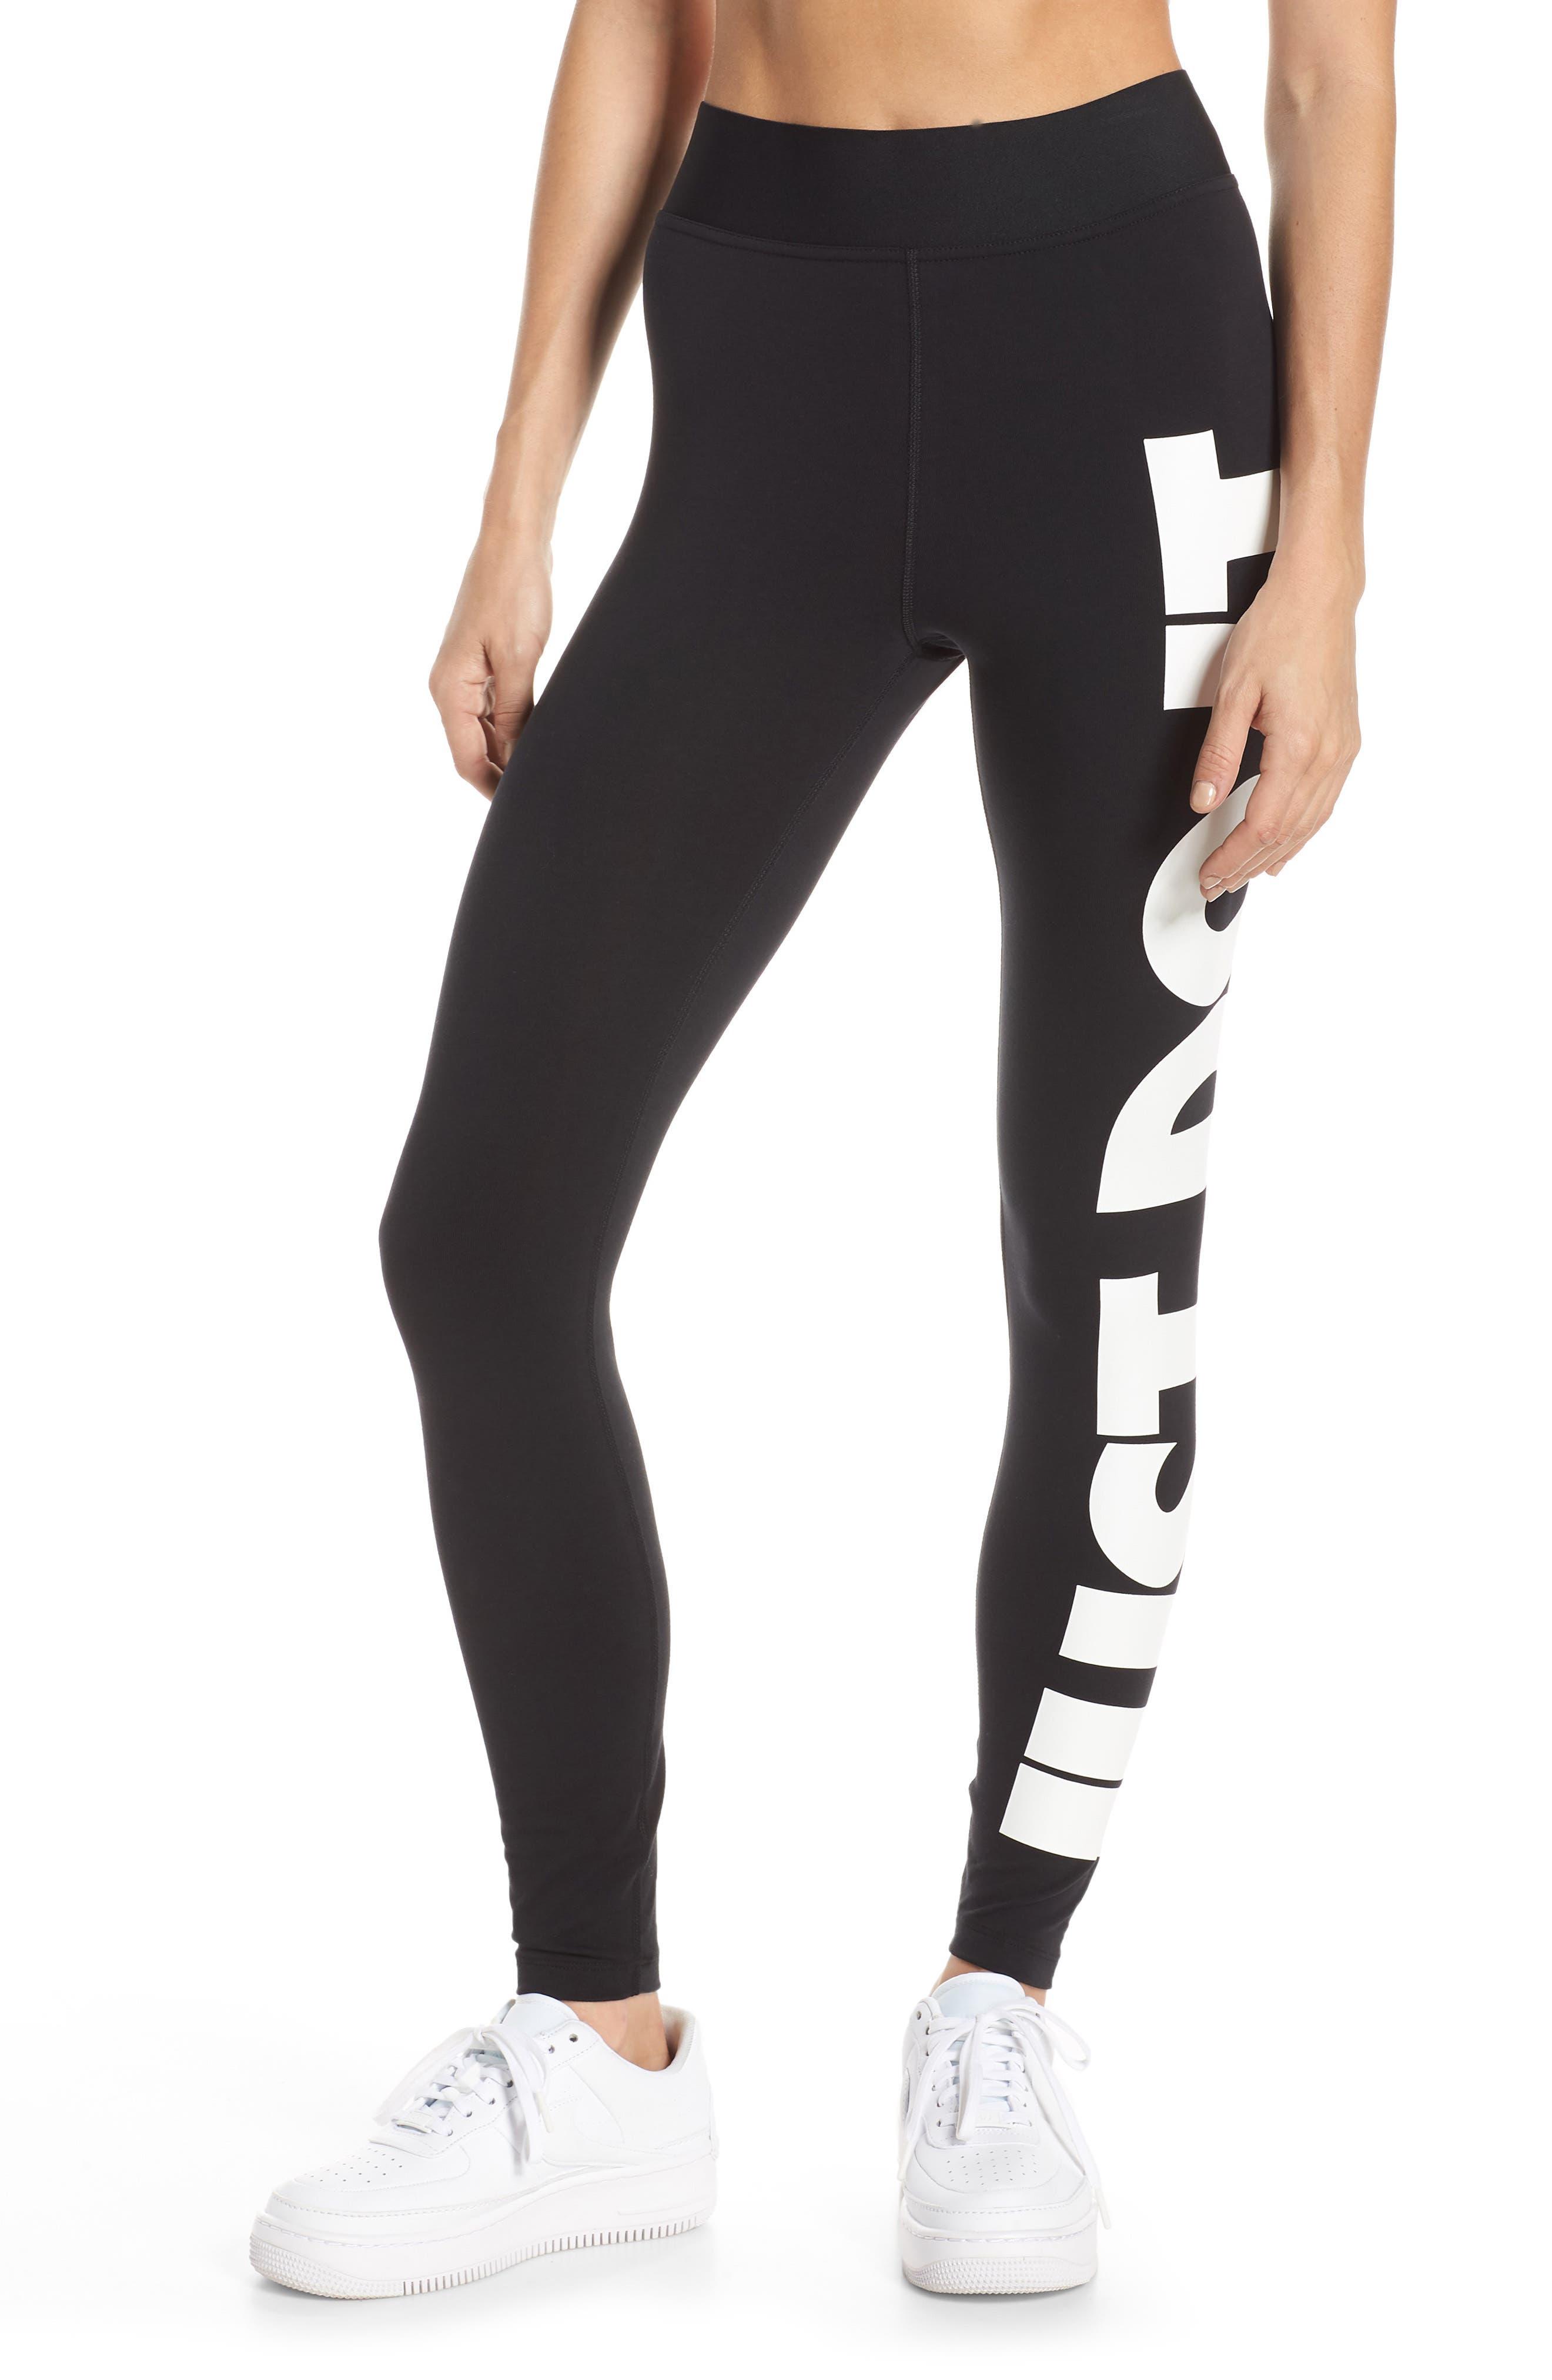 0b9ccac39b12b Women's Nike High-Waisted Pants & Leggings